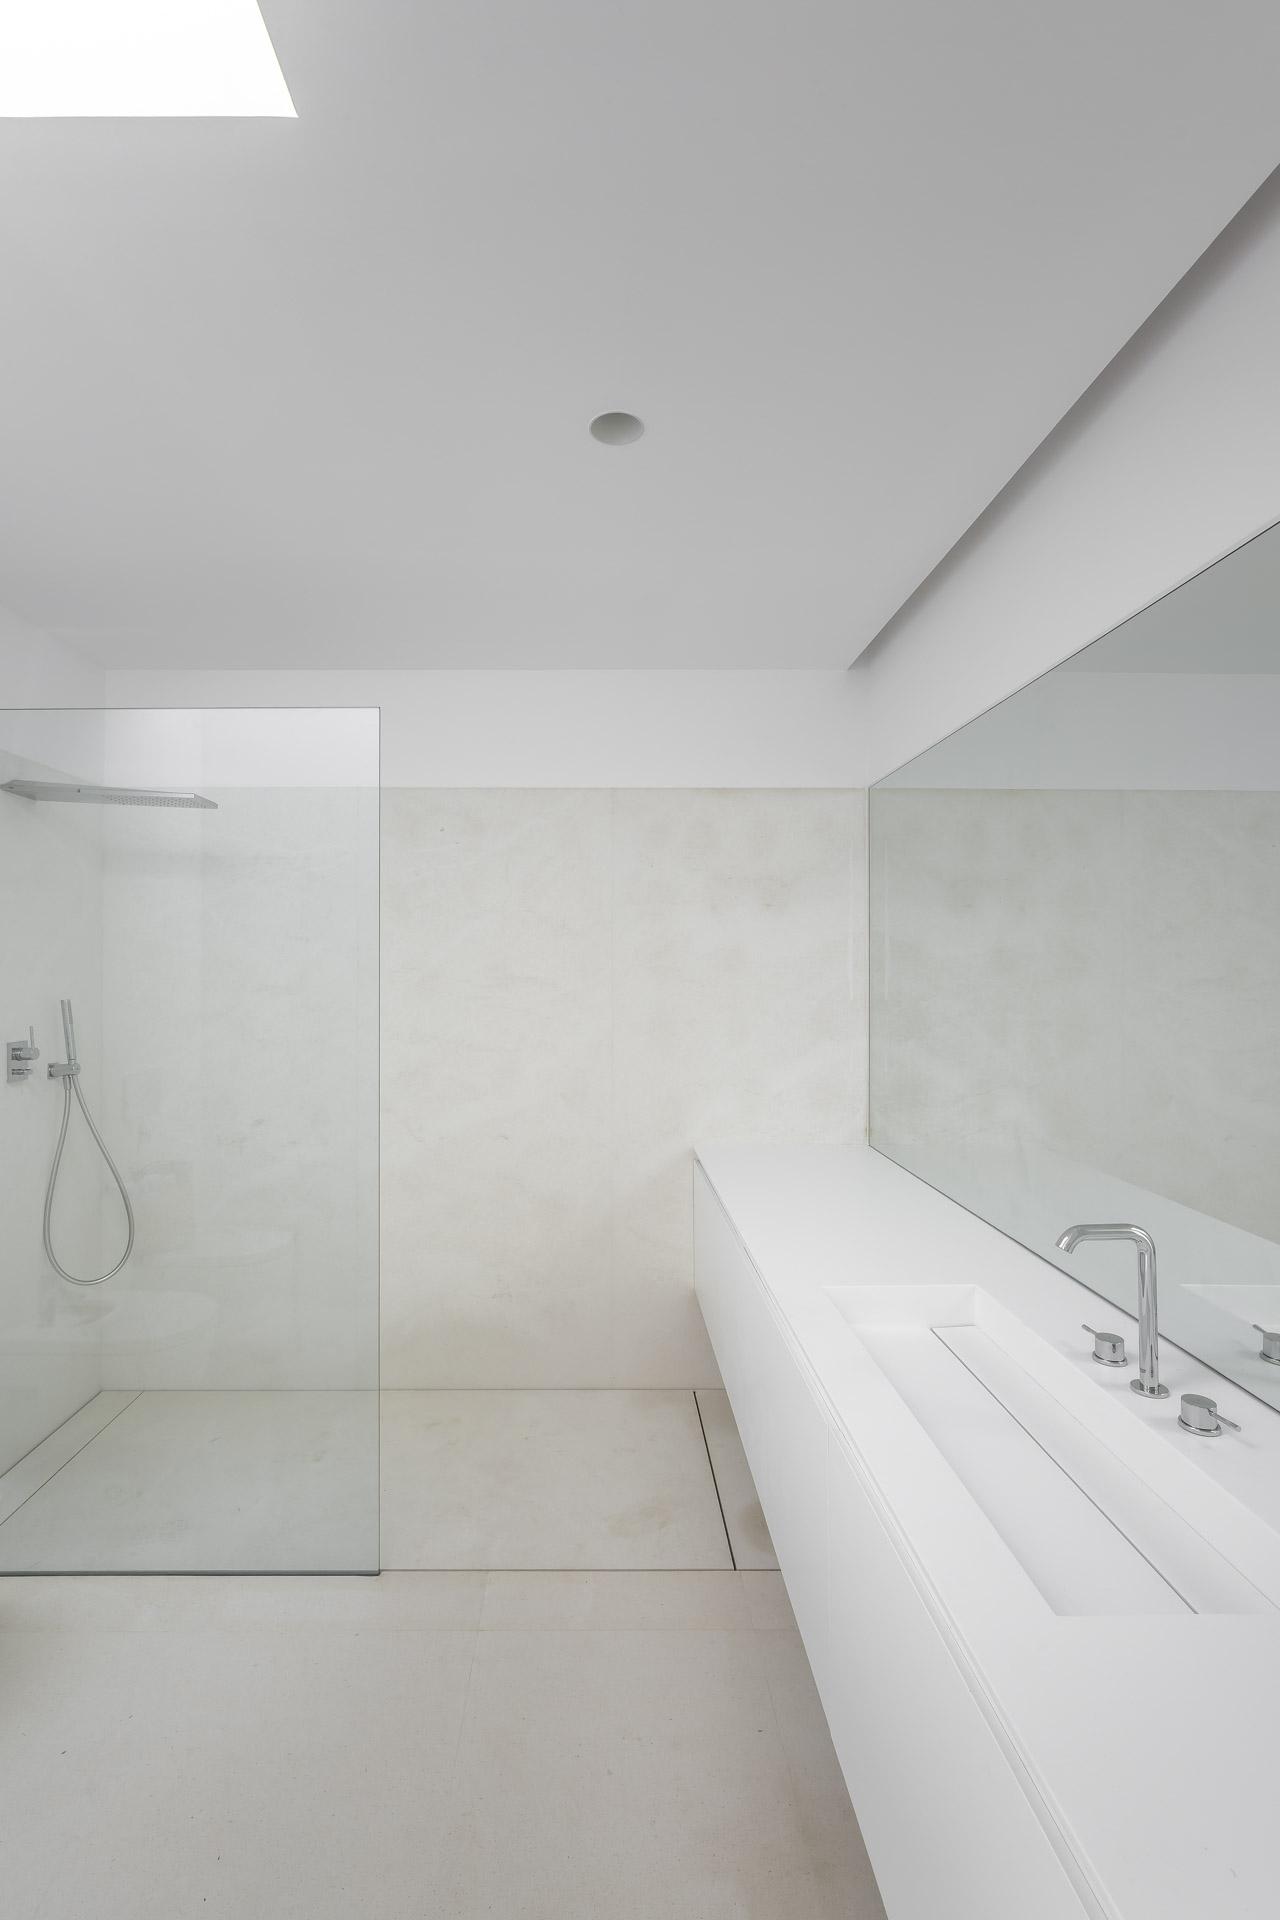 fotografia-arquitectura-valencia-german-cabo-gallardo-llopis-villamarchante-vivienda-26